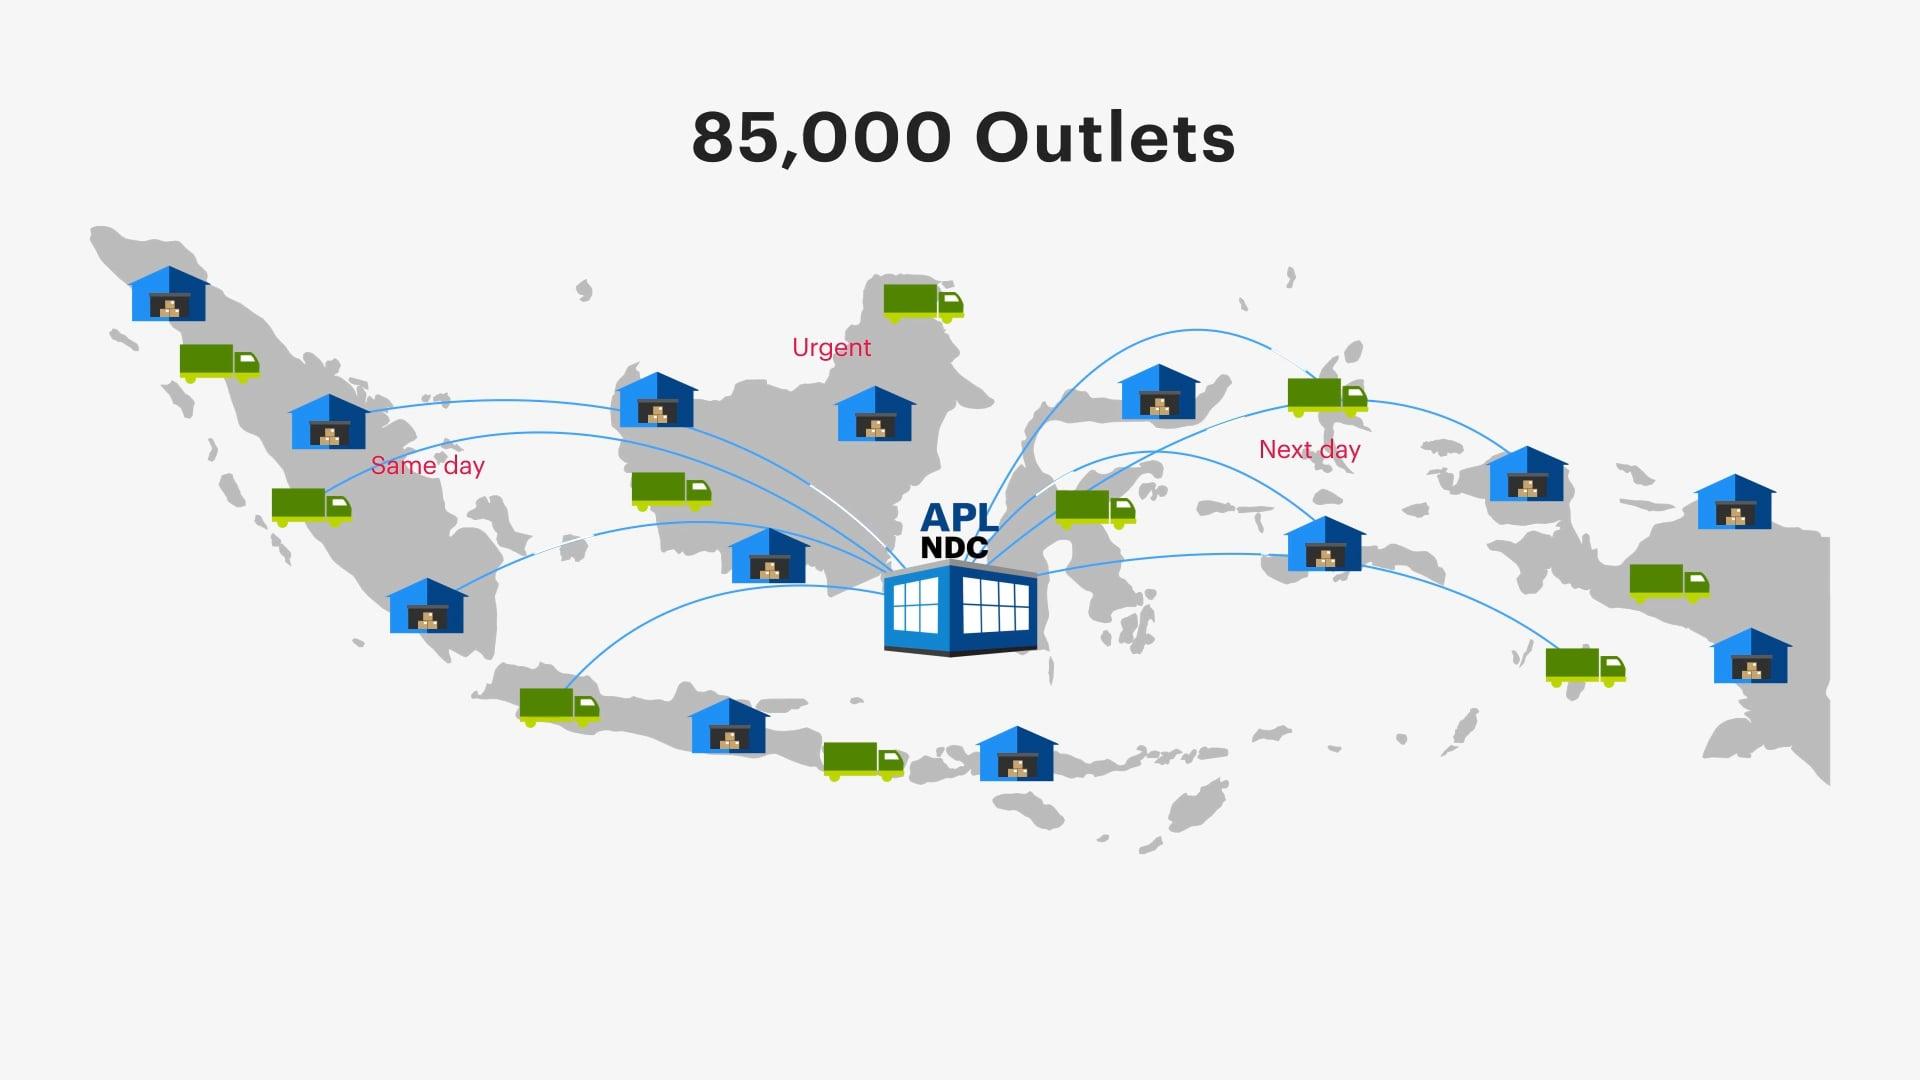 APL - Digitizing its Distribution Network through Zyllem